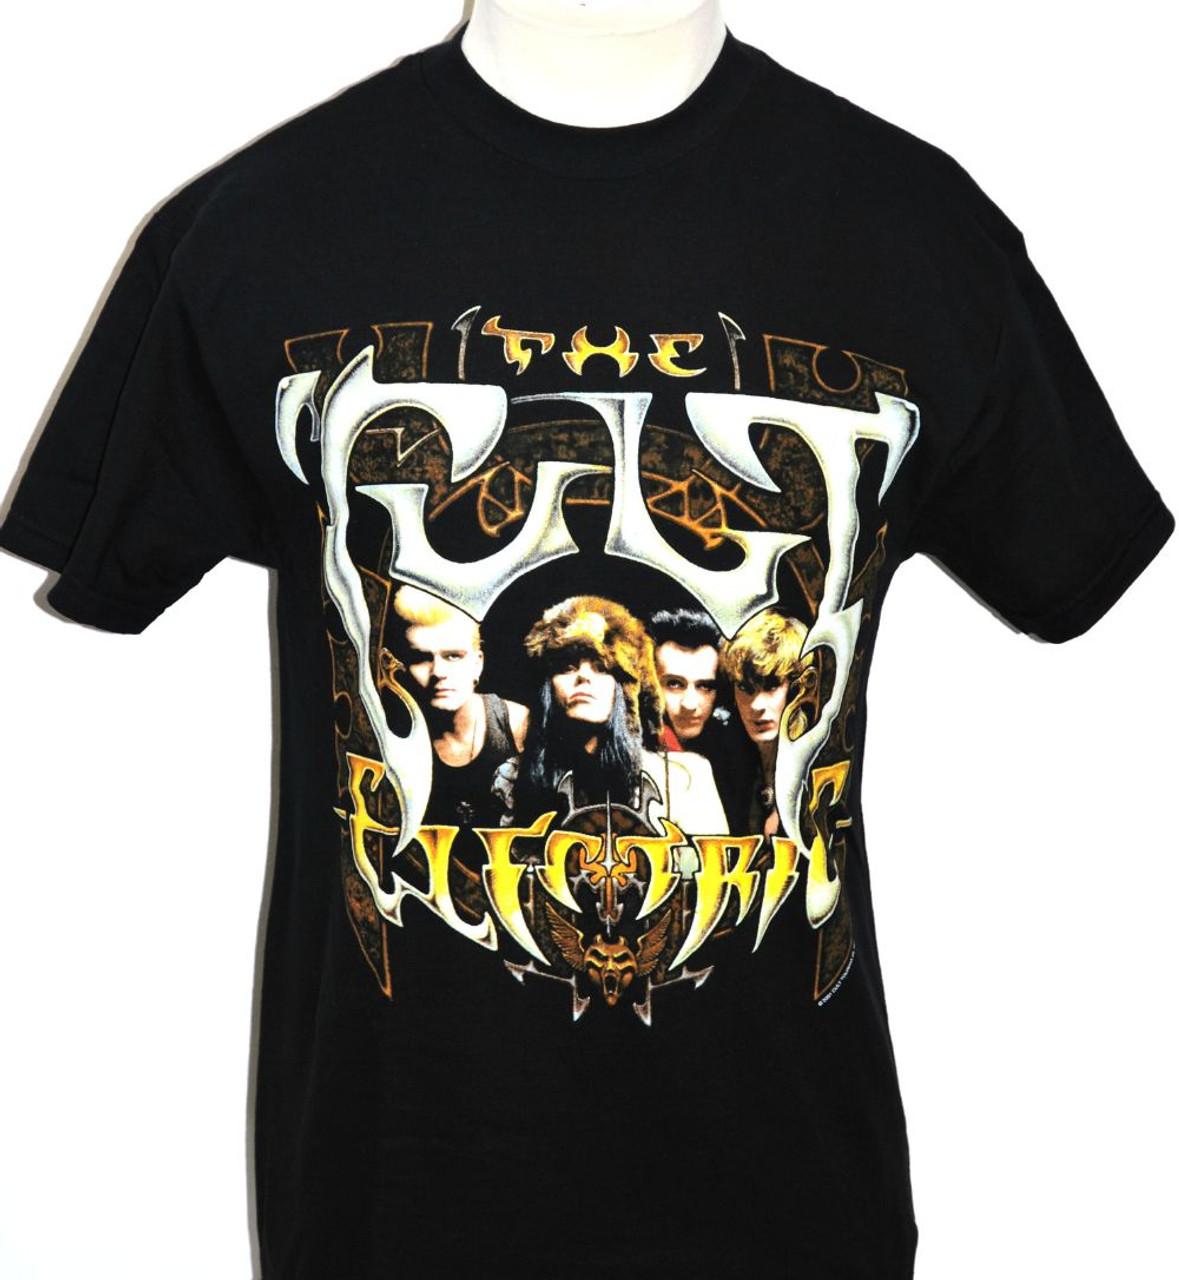 The Cult T-shirt Electric Album Cover Artwork Men s Black - Rocker Rags 4237f0268